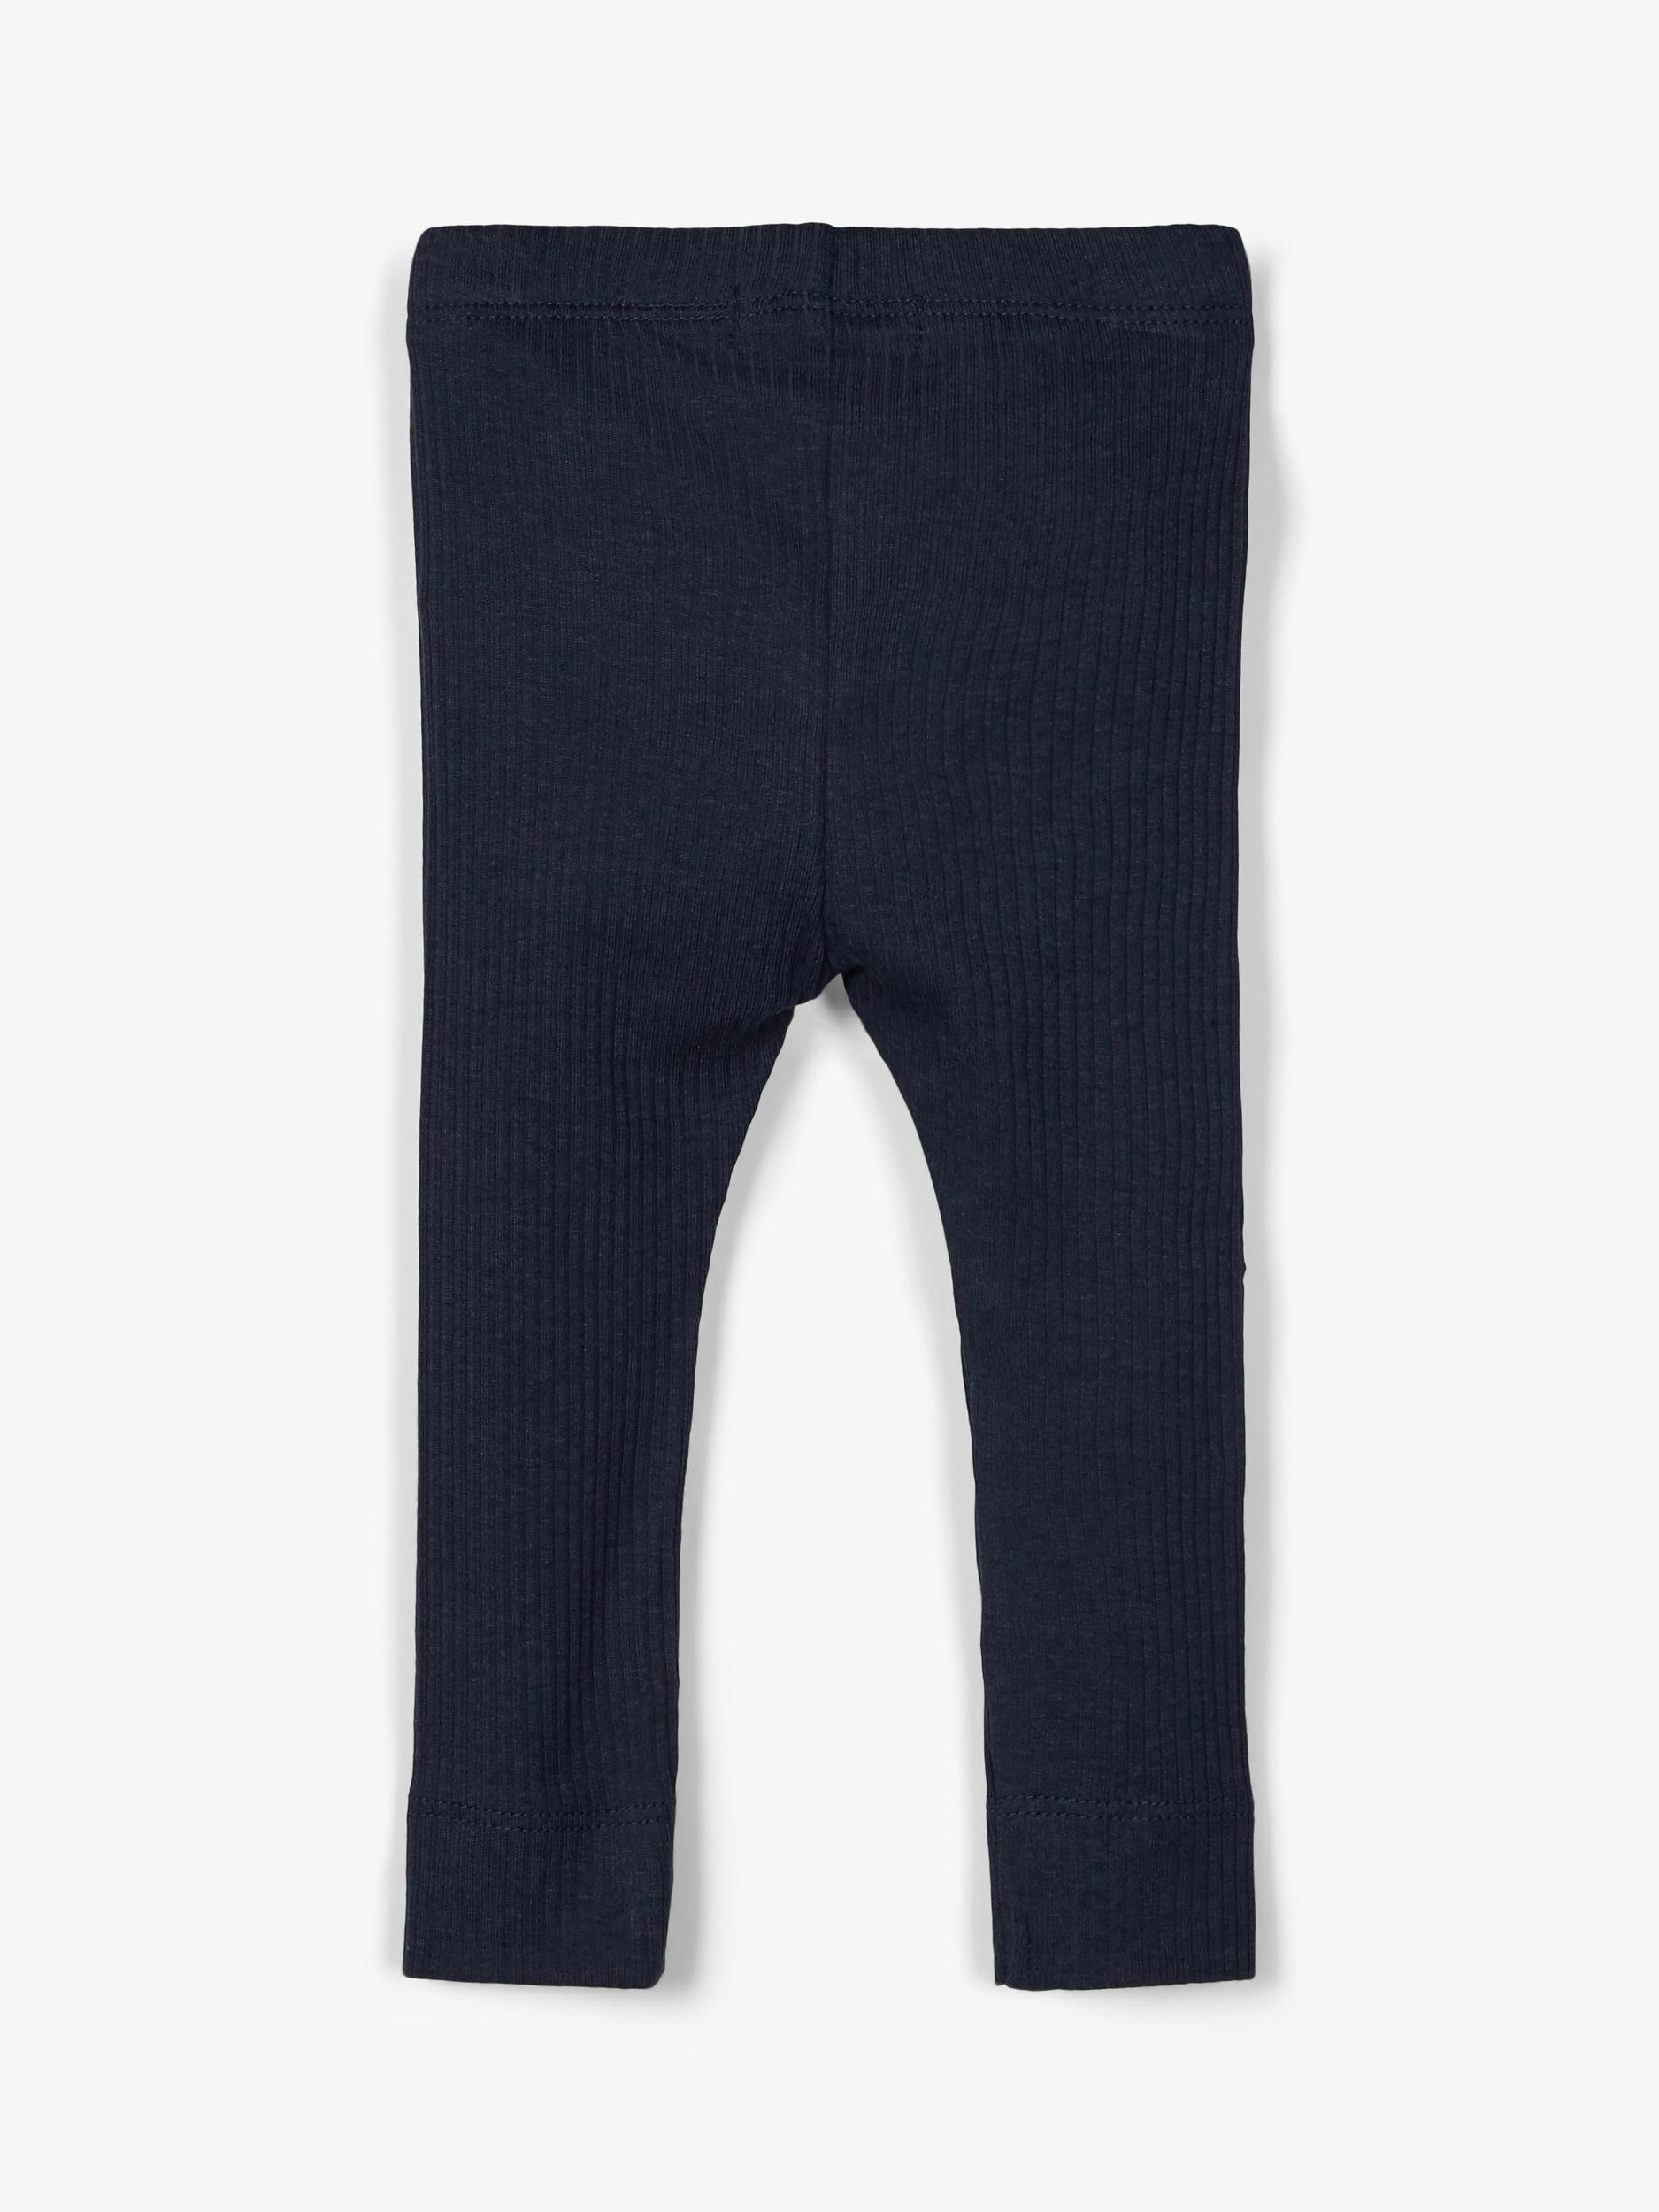 Name It Bille rib leggings, dark sapphire, 68